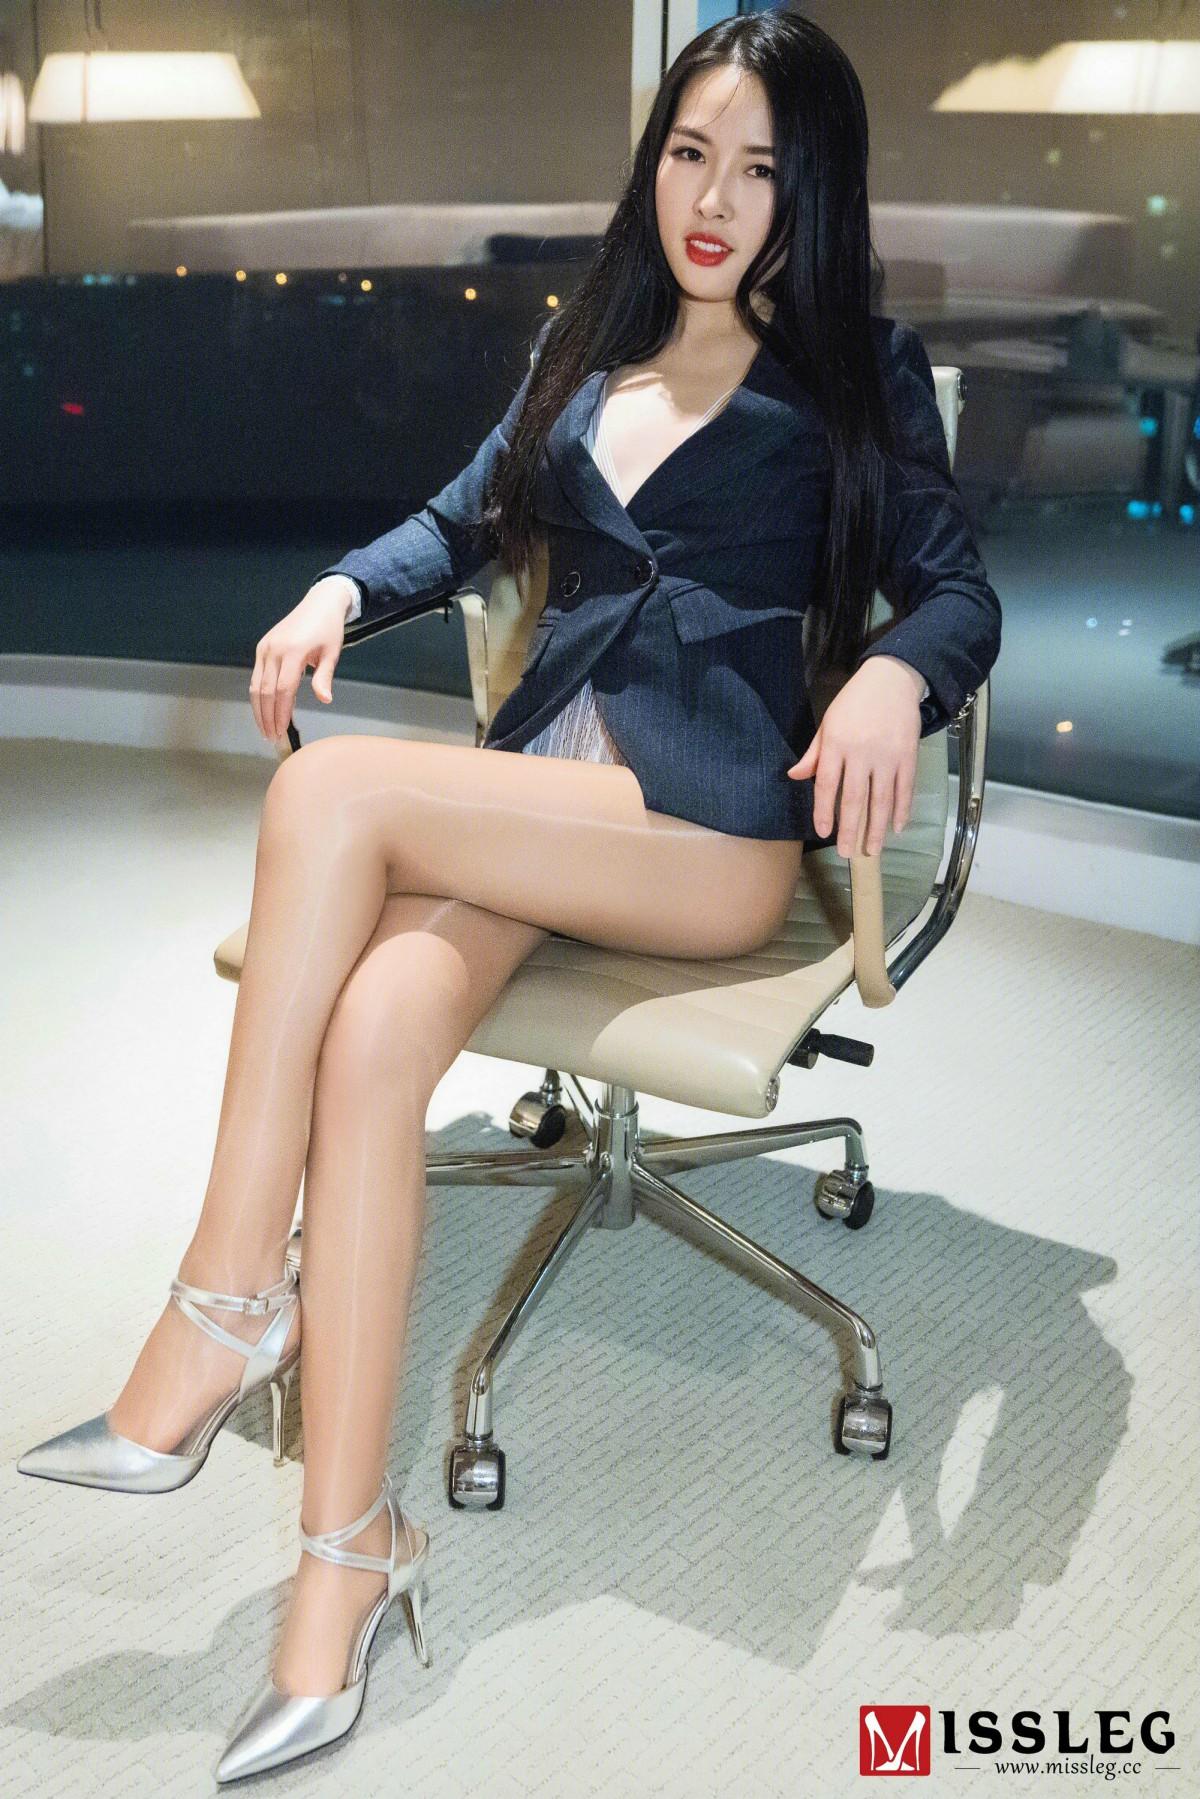 [MISSLEG蜜丝]蜜丝钻石室内N系列 N017 晨雨&琪琪 《压制》